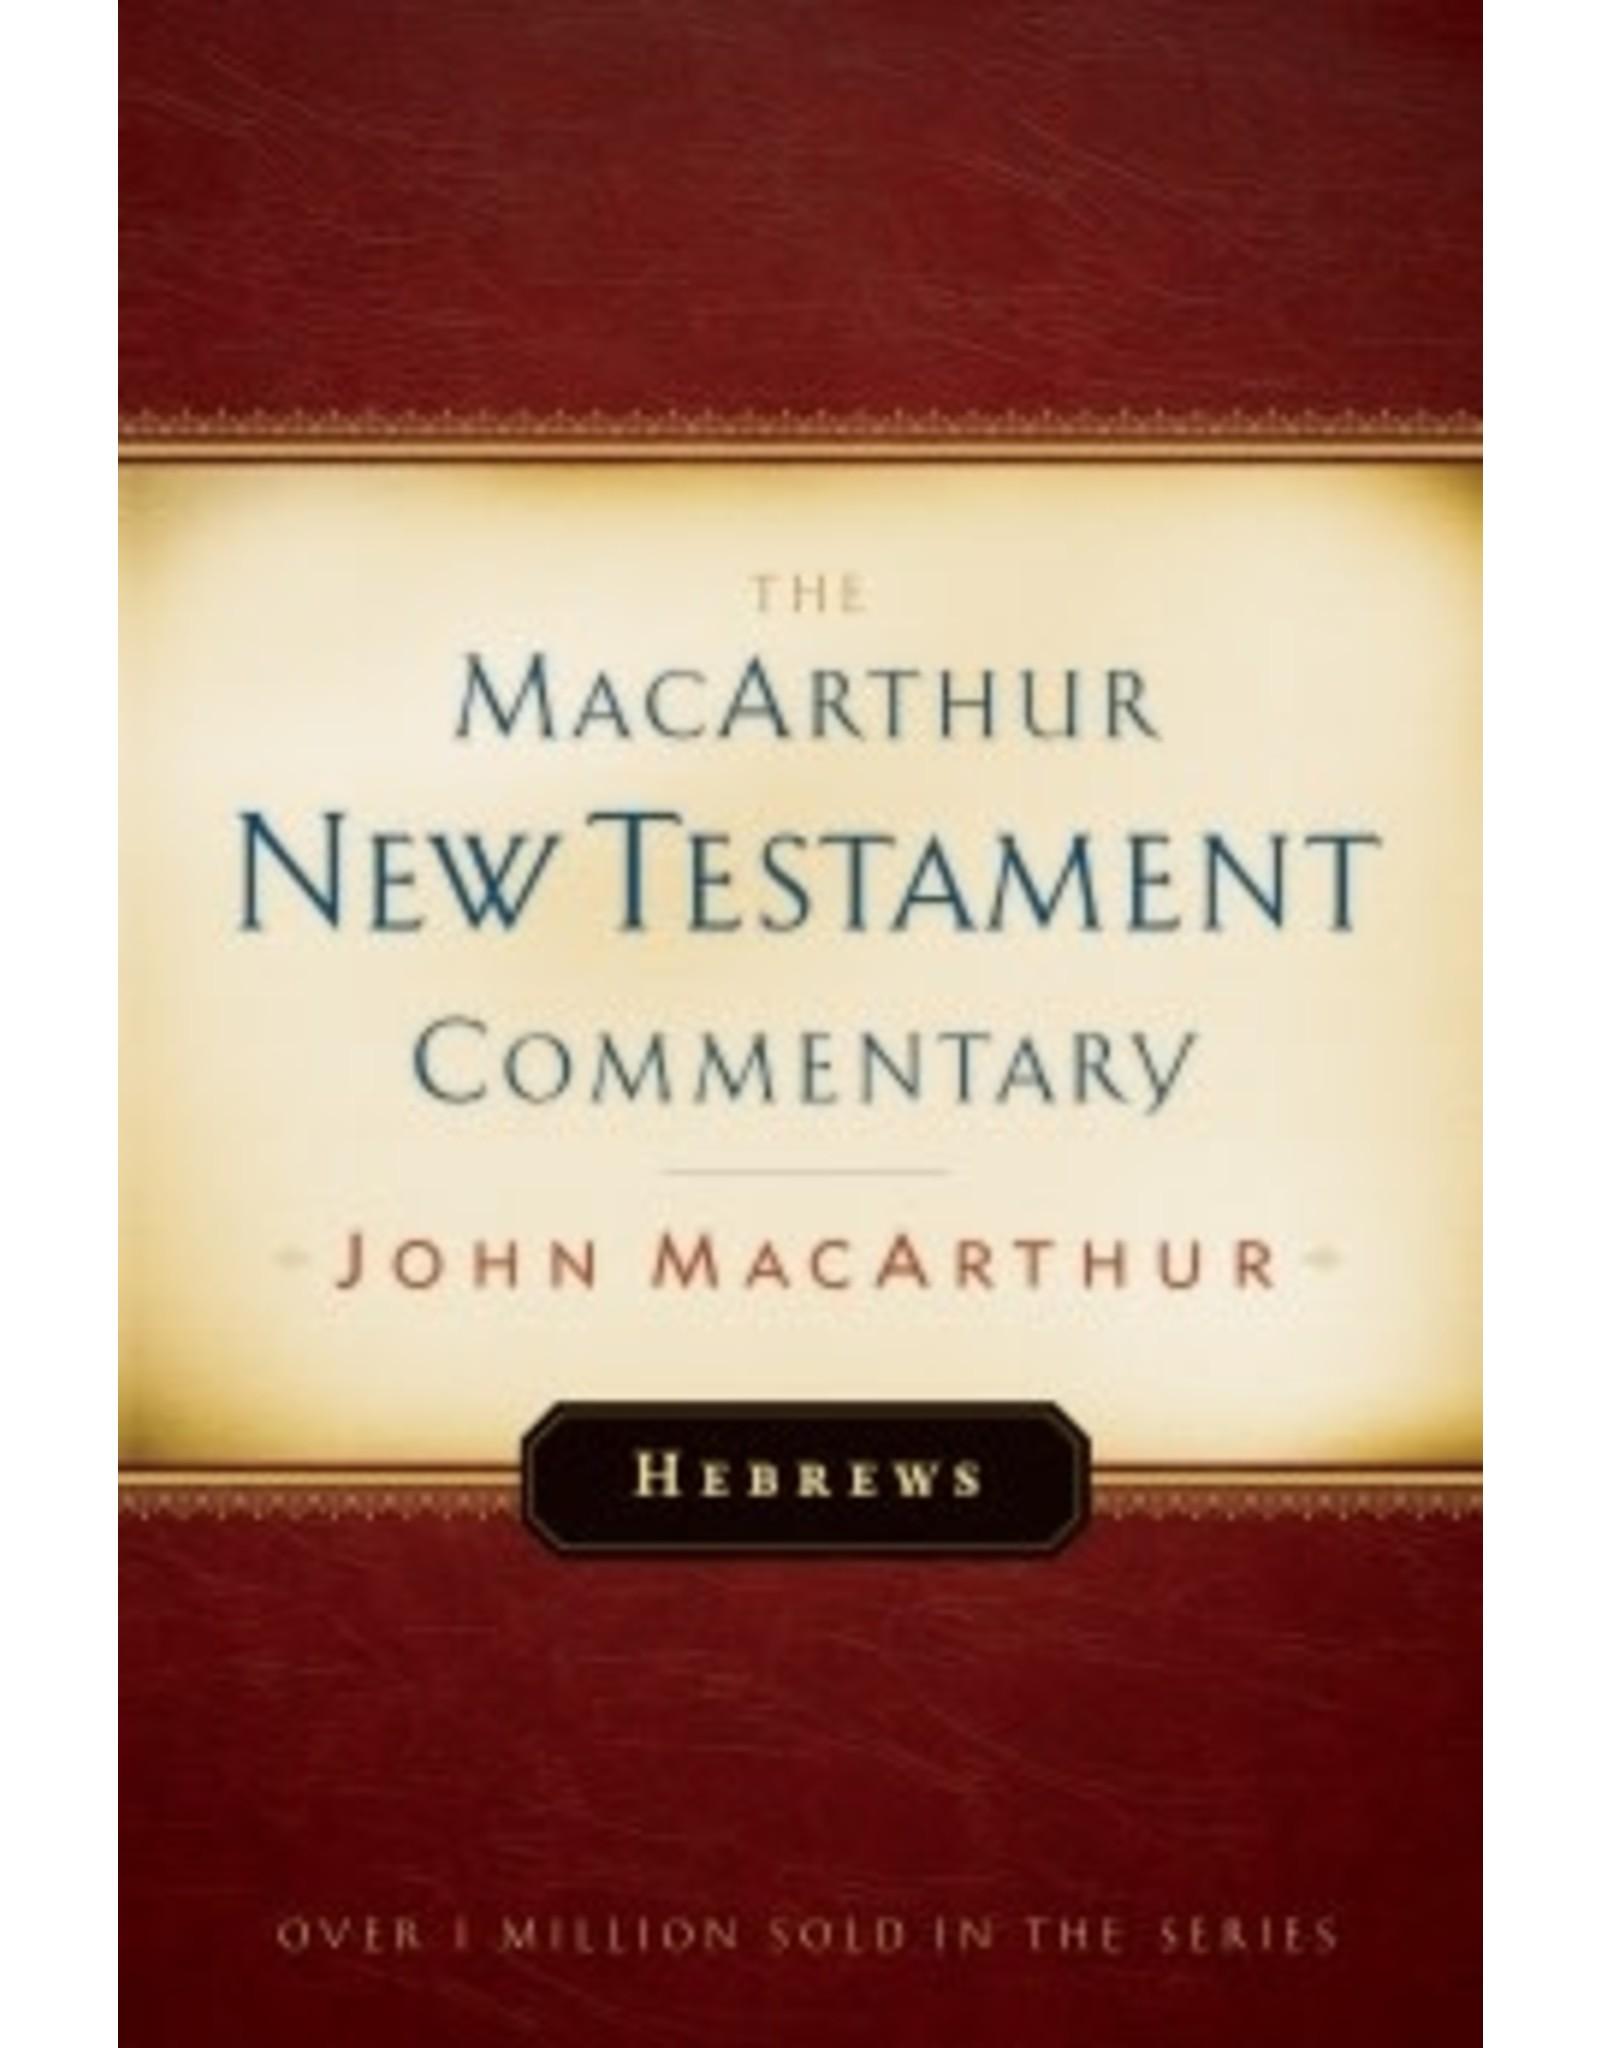 MacArthur MacArthur Commentary - Hebrews